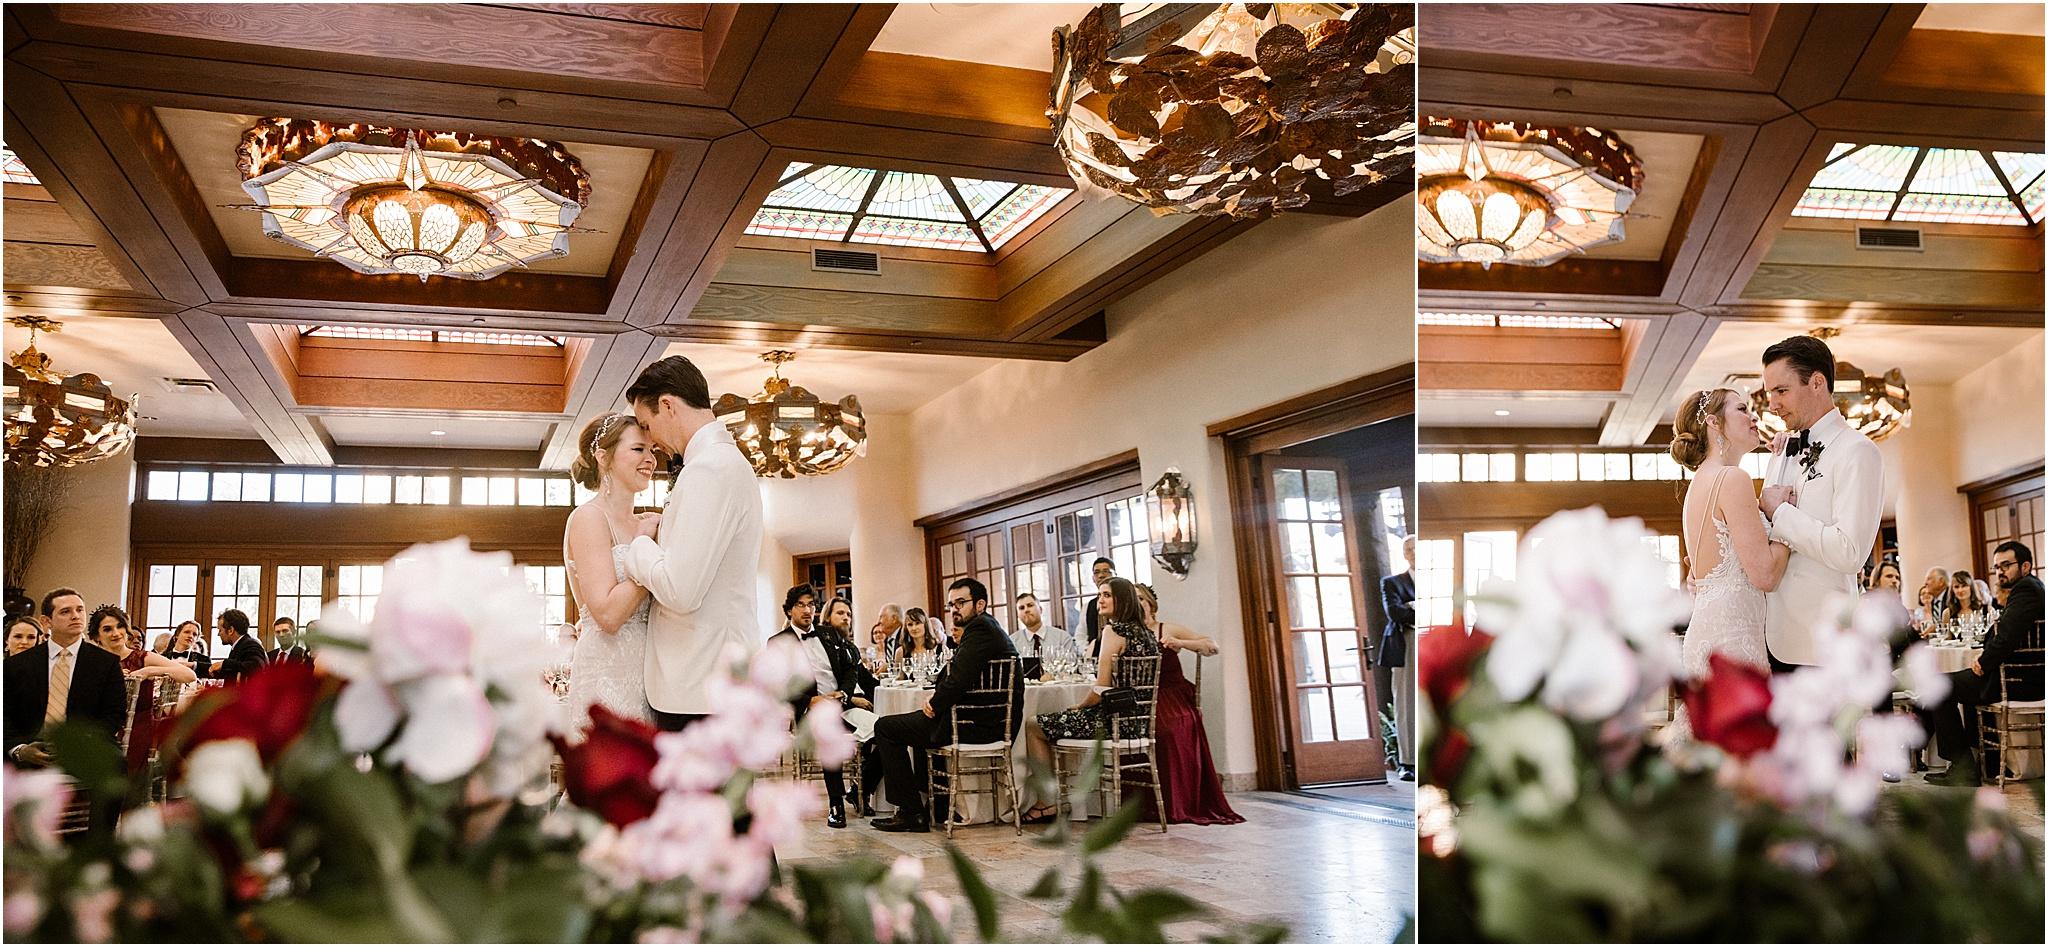 BLUE ROSE PHOTOGRAPHY SANTA FE WEDDING_47